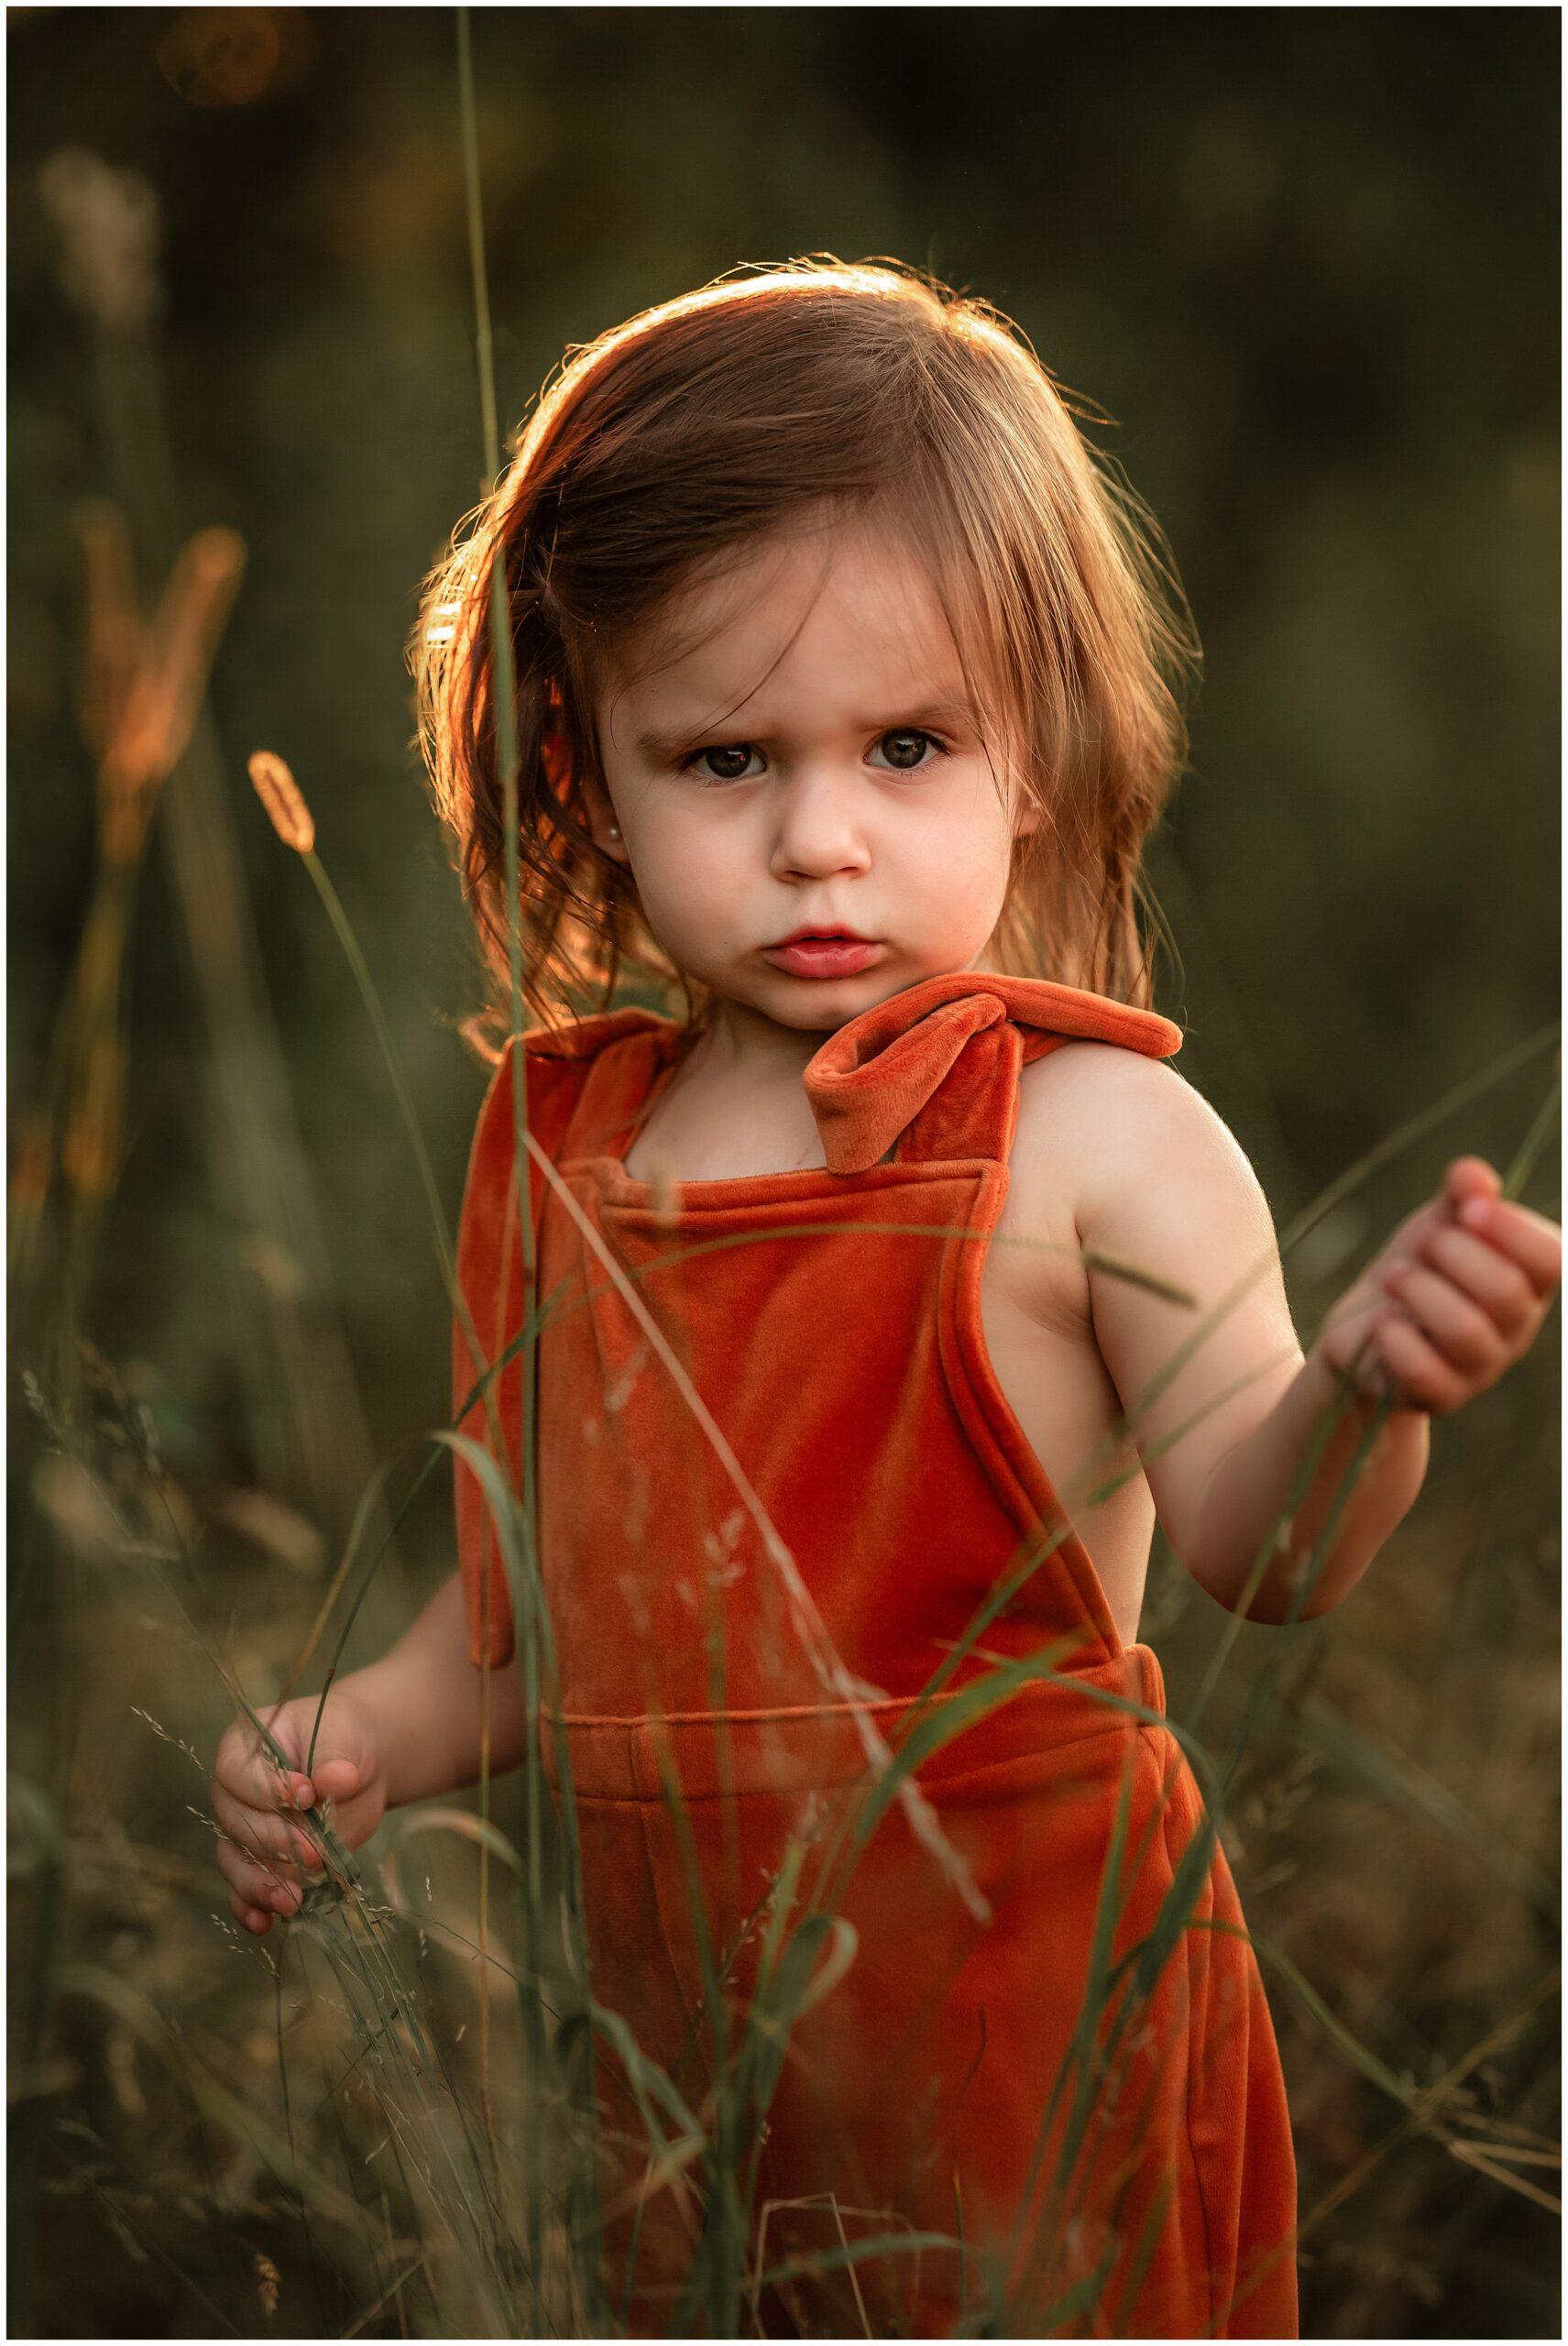 2020 10 07 0004.Pittsburgh Child Photographer boho baby 4